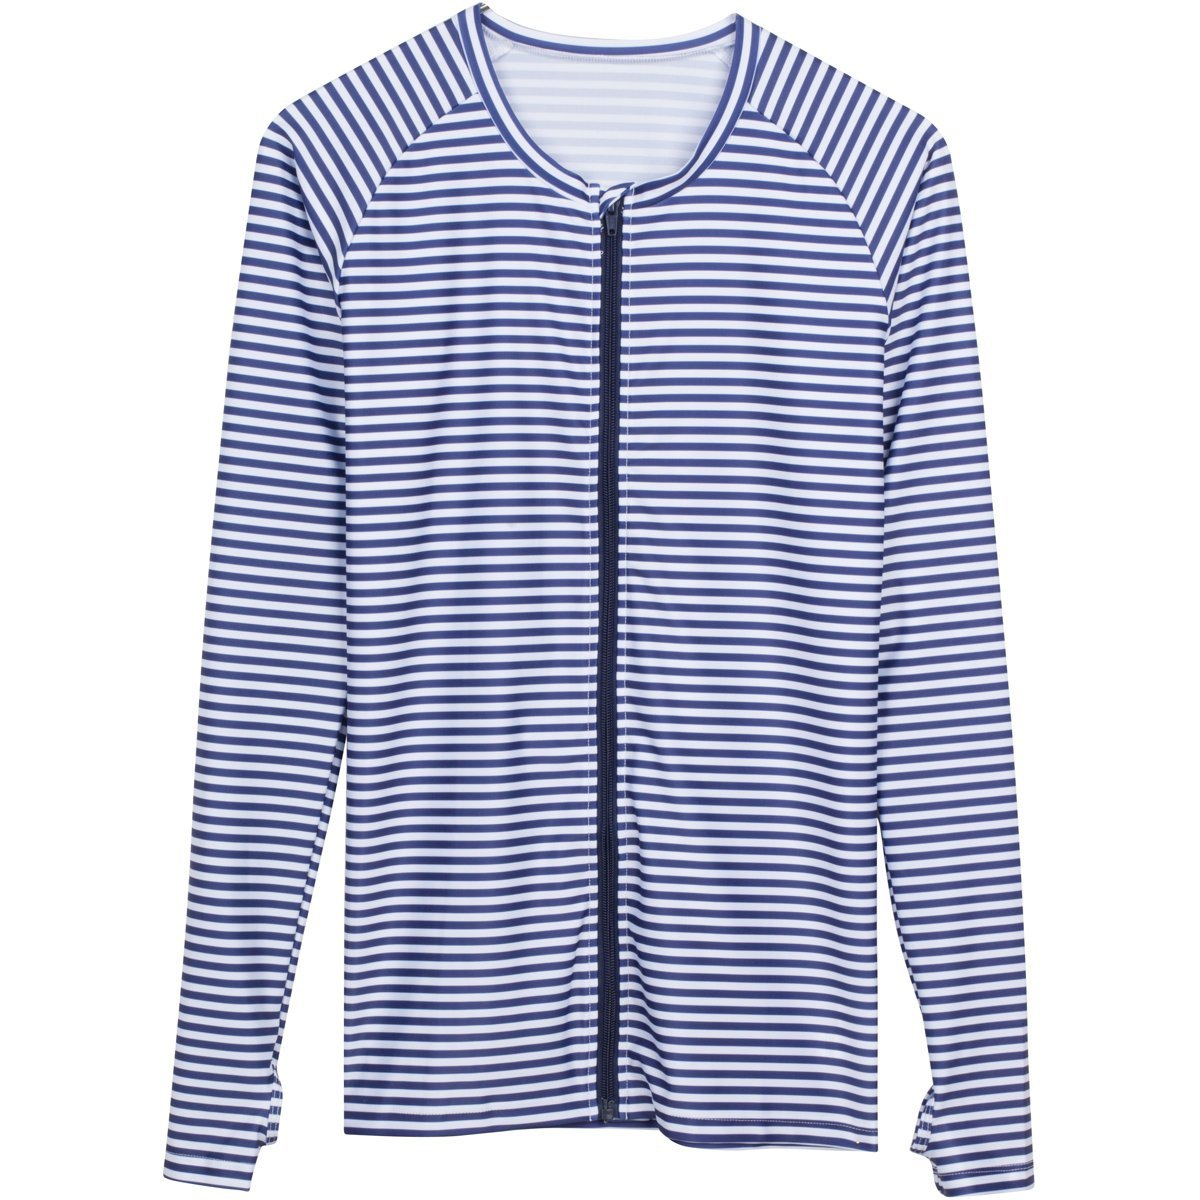 SwimZip Women's Long Sleeve Rash Guard Zip Swim Shirt SPF 50+